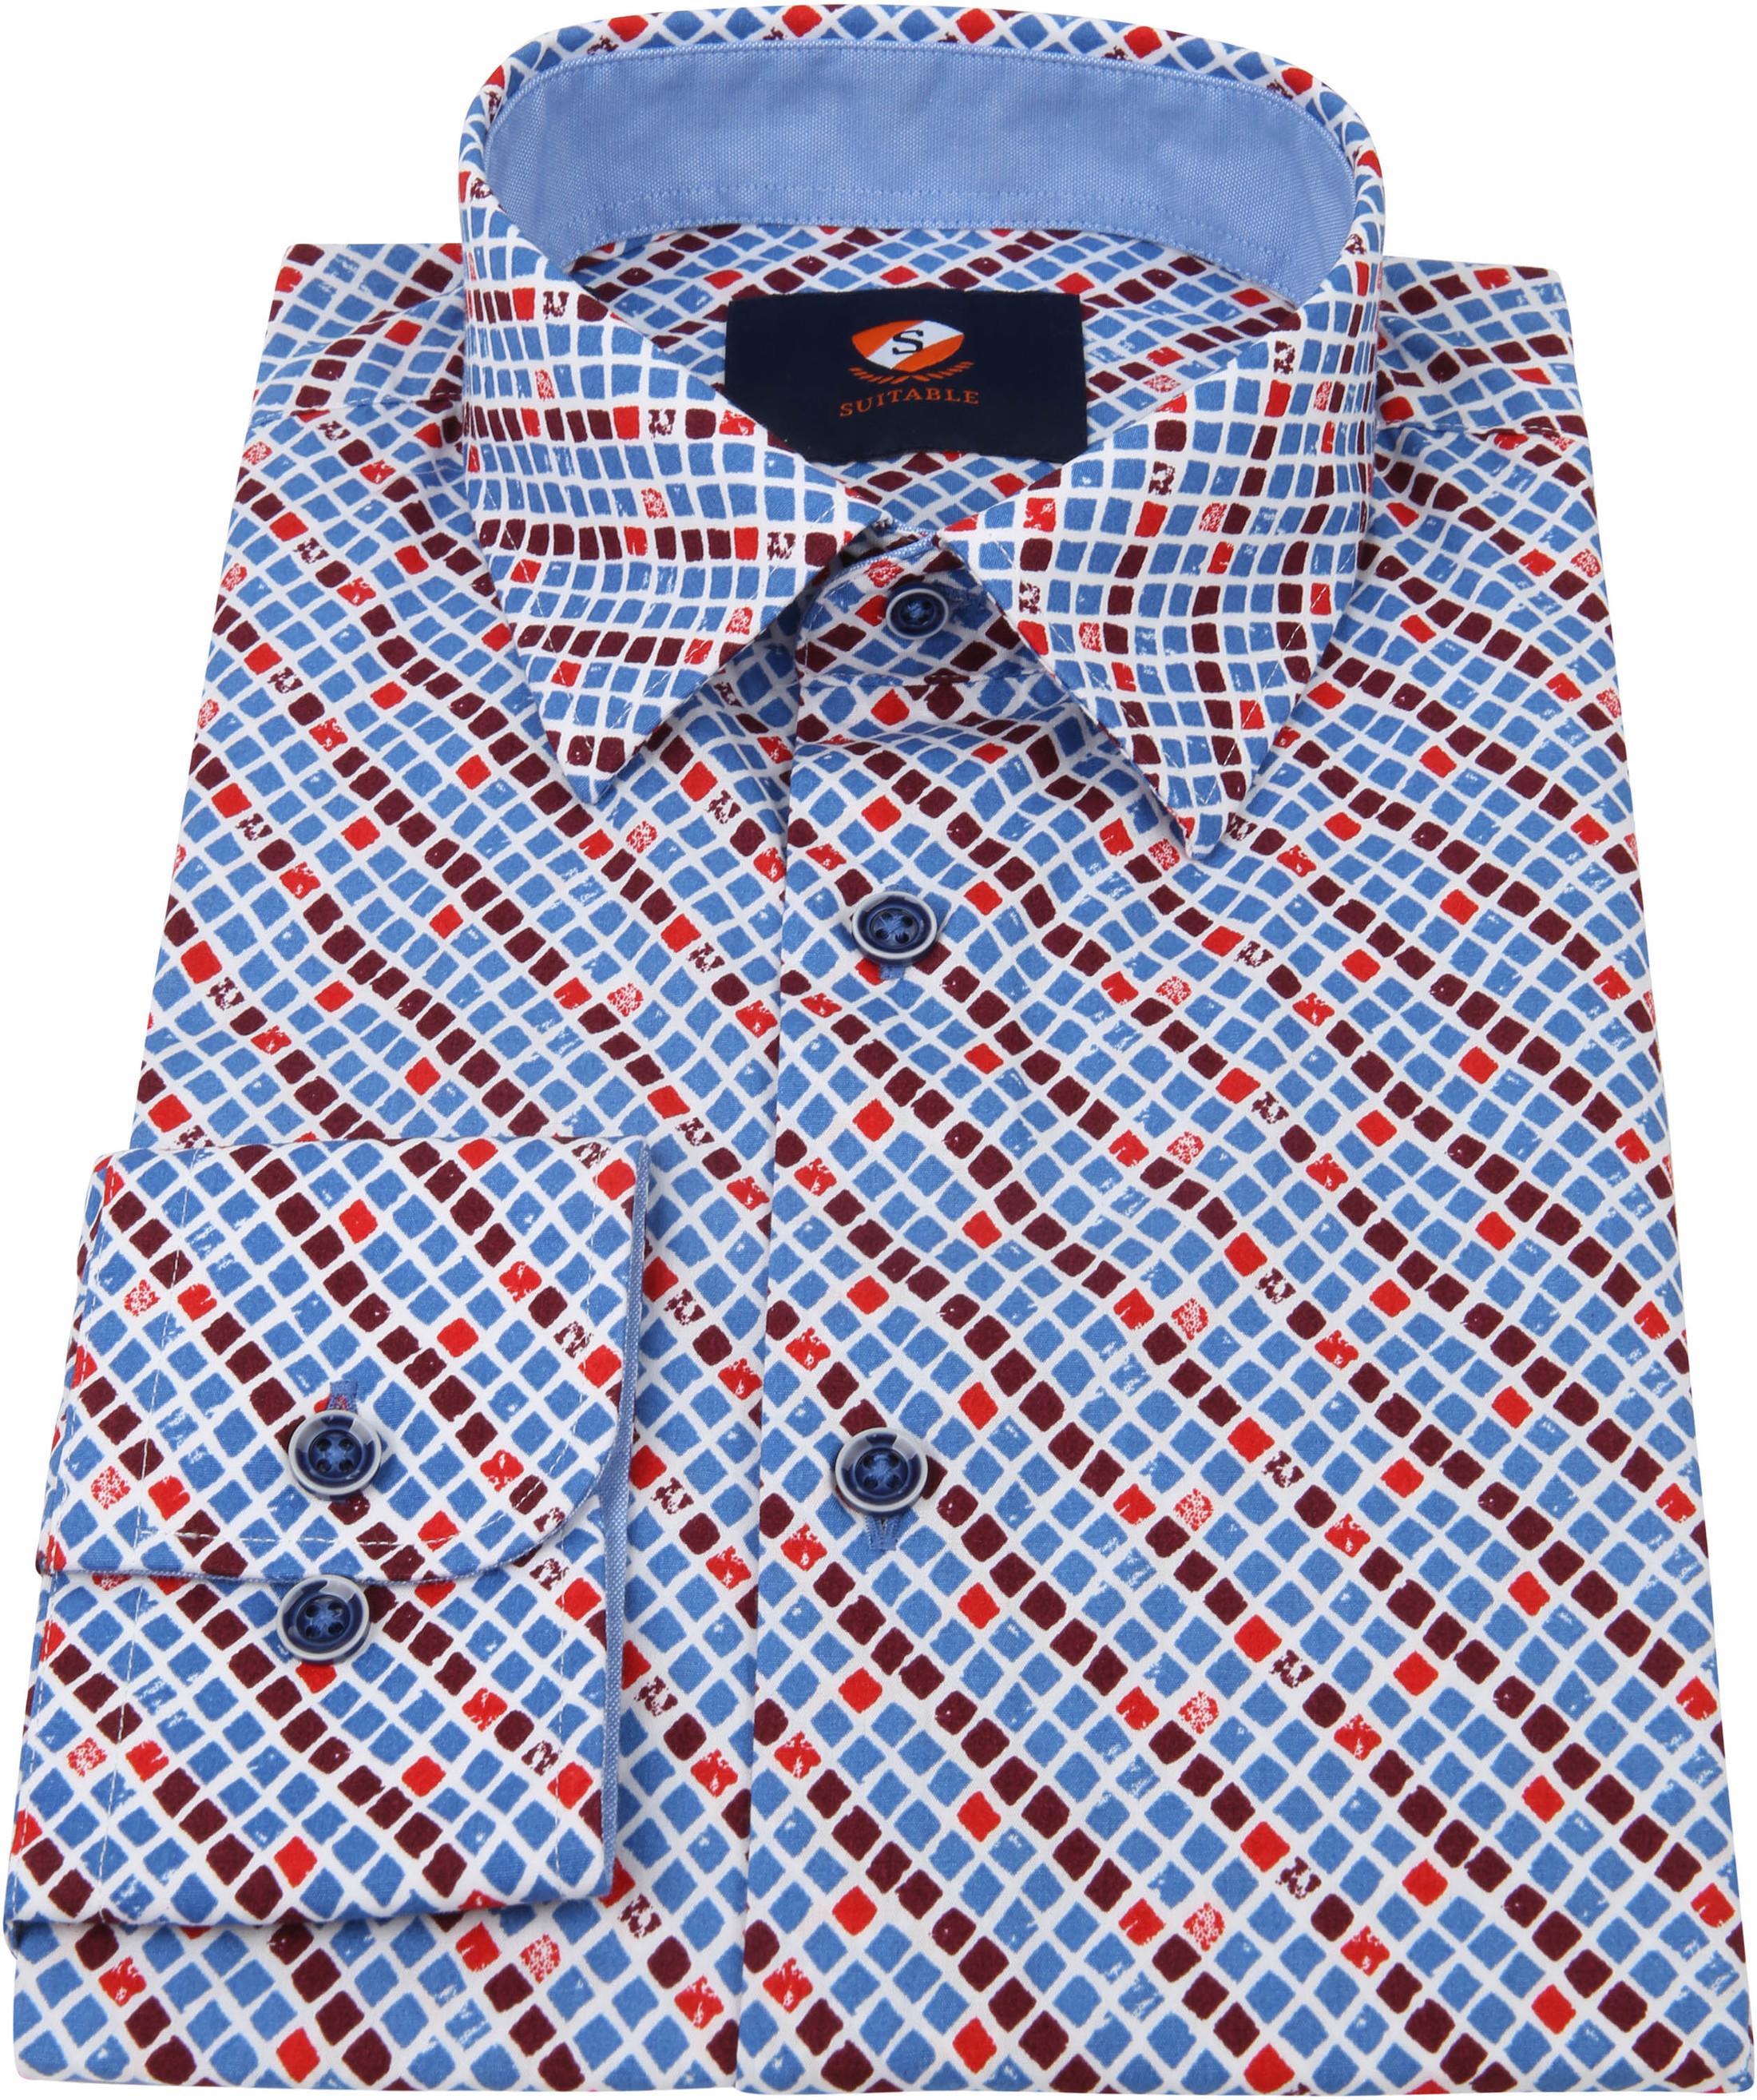 Suitable Overhemd Ruit Blauw Rood